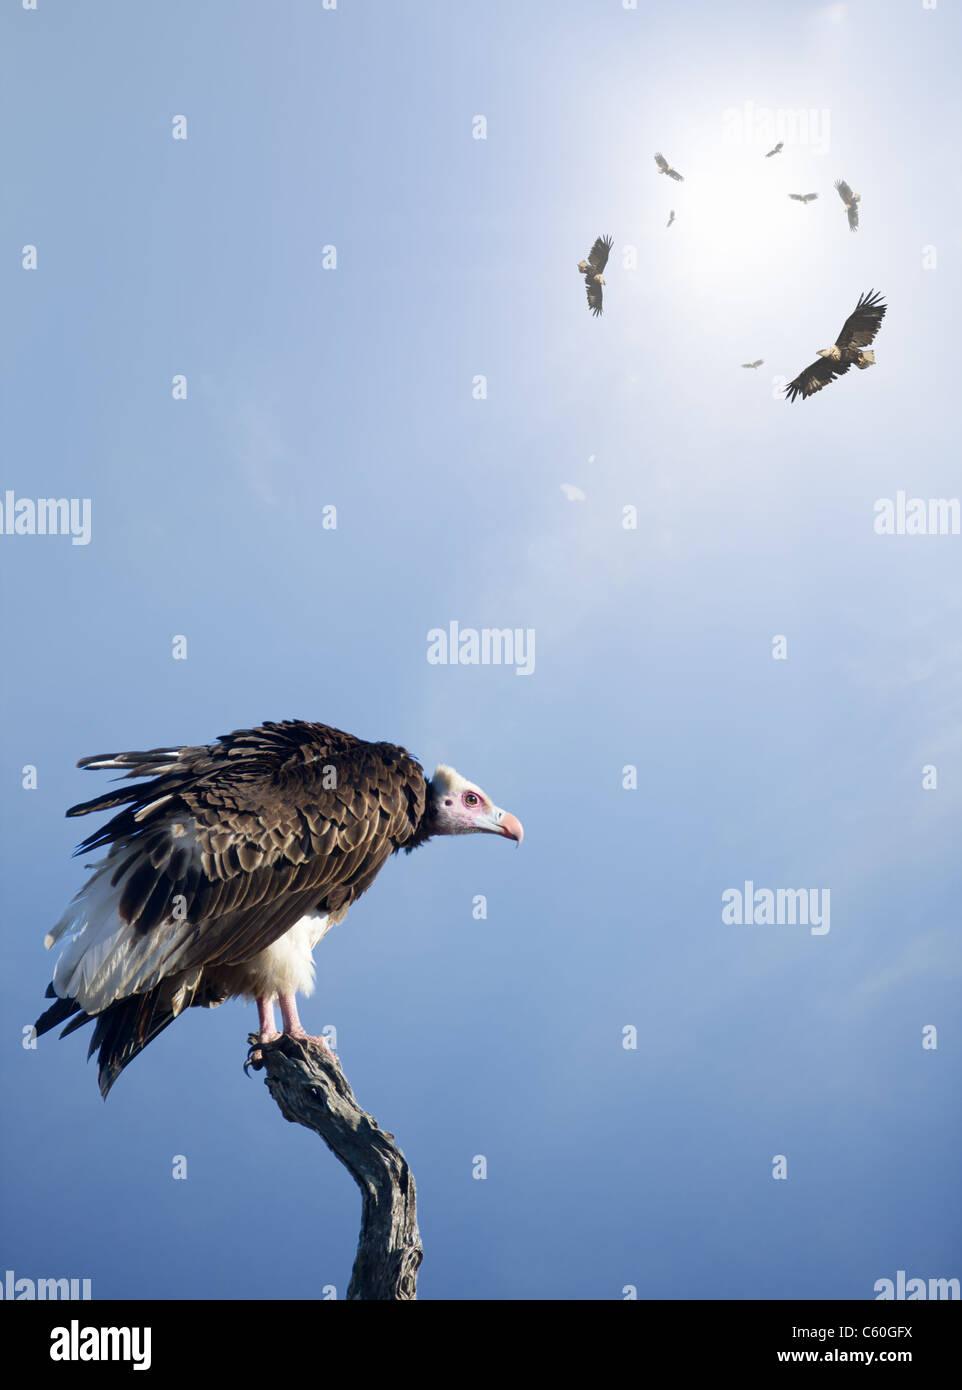 Conceptual - Geier warten darauf, Jagd auf unschuldige Opfer (digital Composite) Stockbild